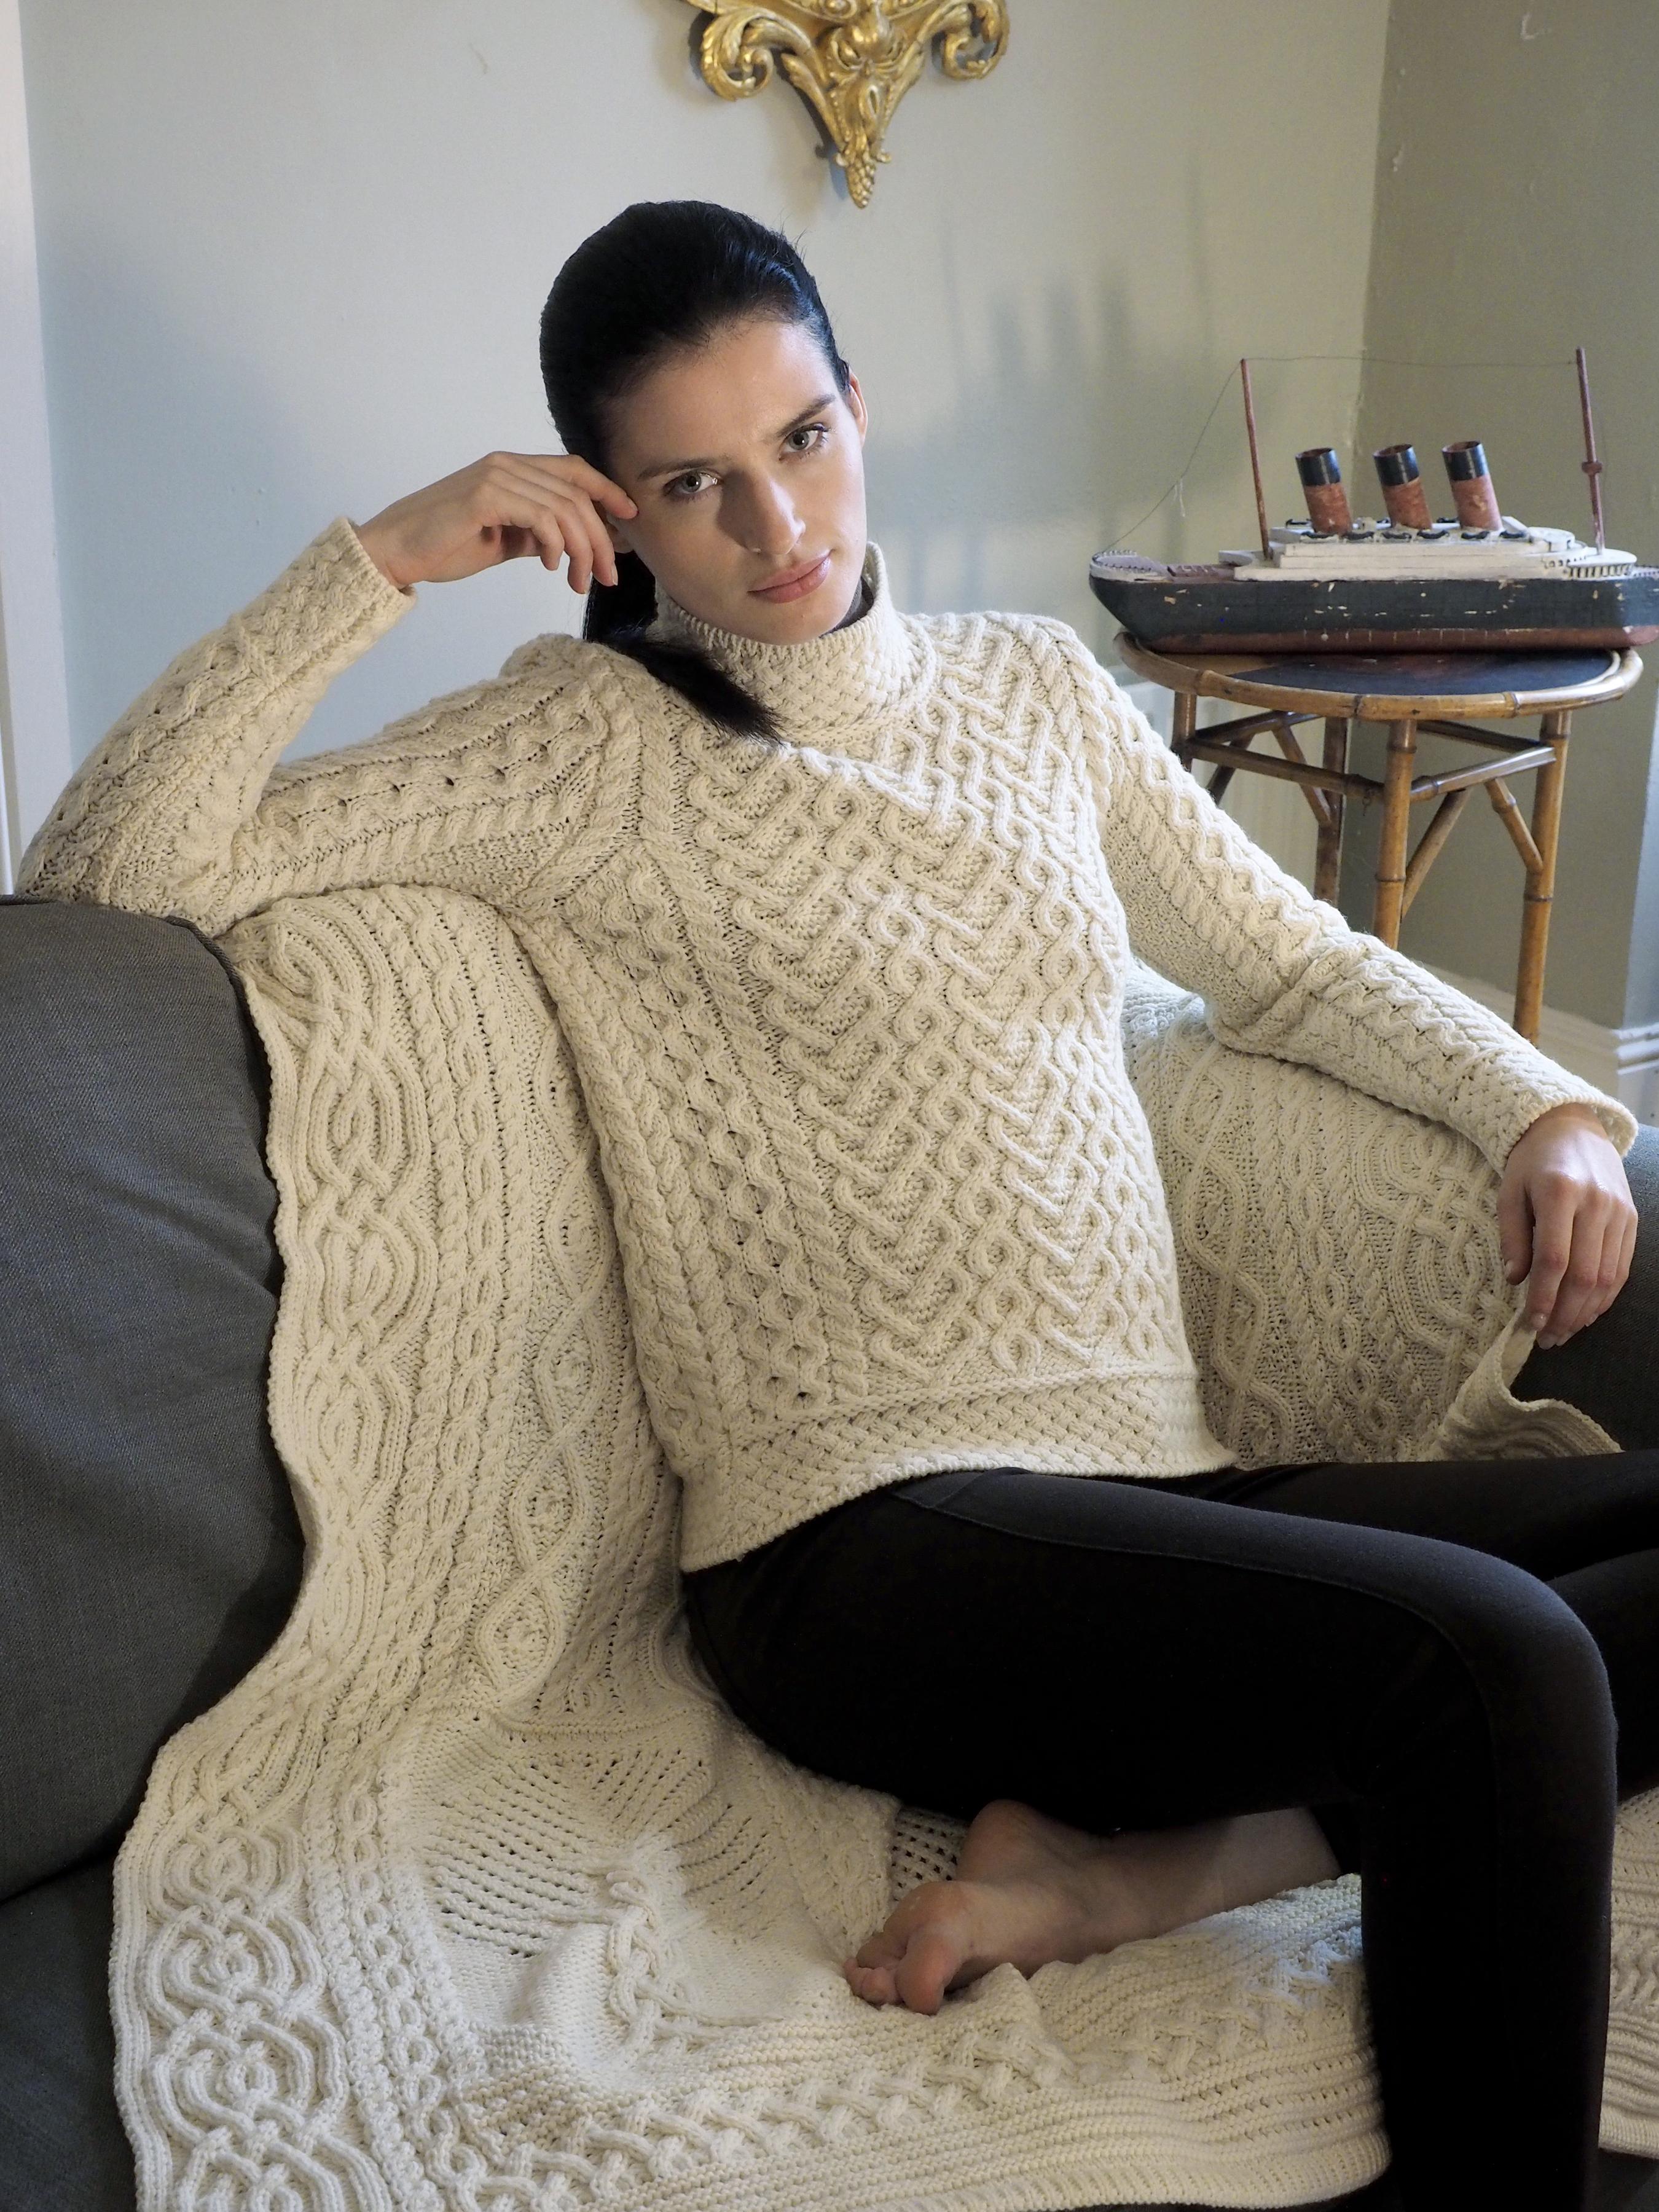 Aran Heart Knit Sweater By Aran Crafts Ireland Skellig Gift Store